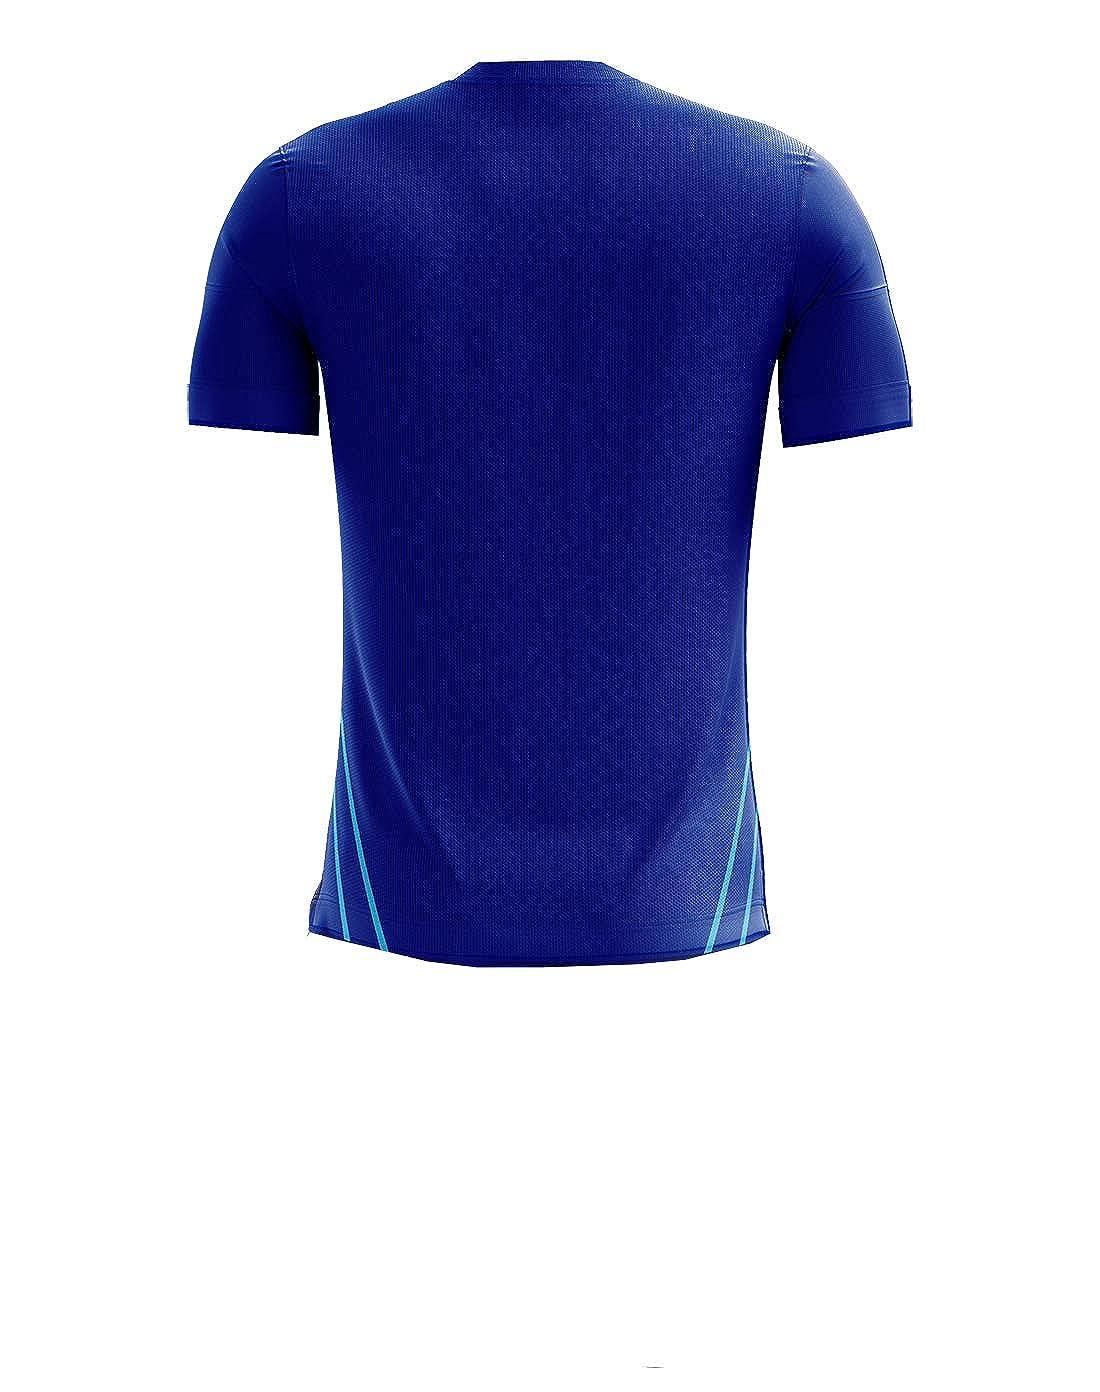 Sky Blue Kabaddi T Shirt New Model 2020